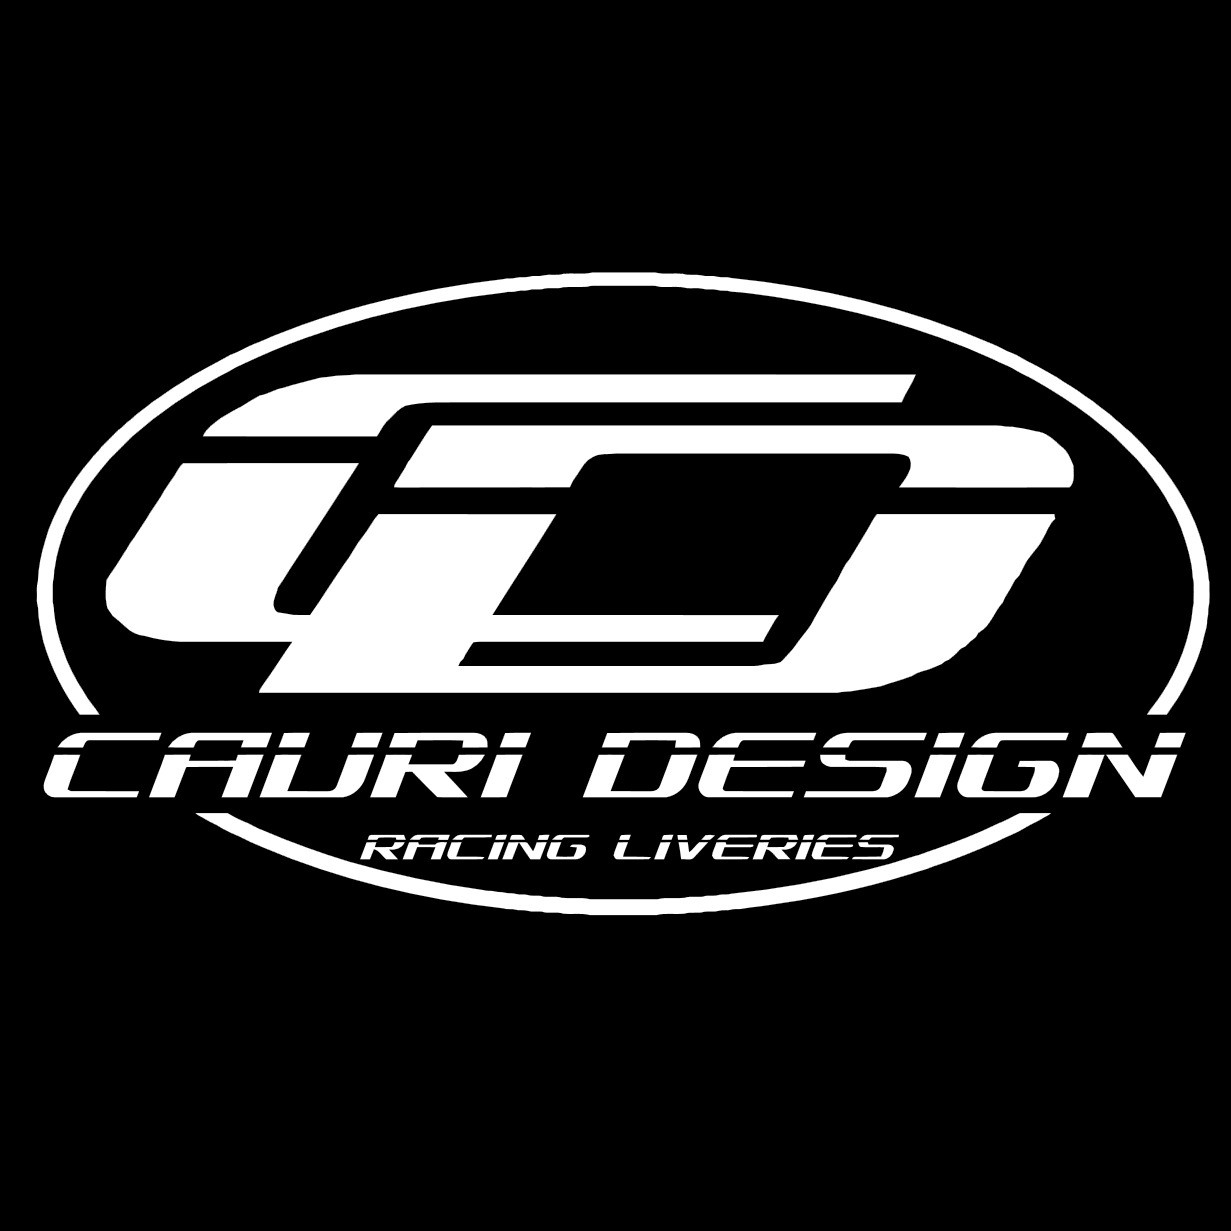 cauri design racing liveries